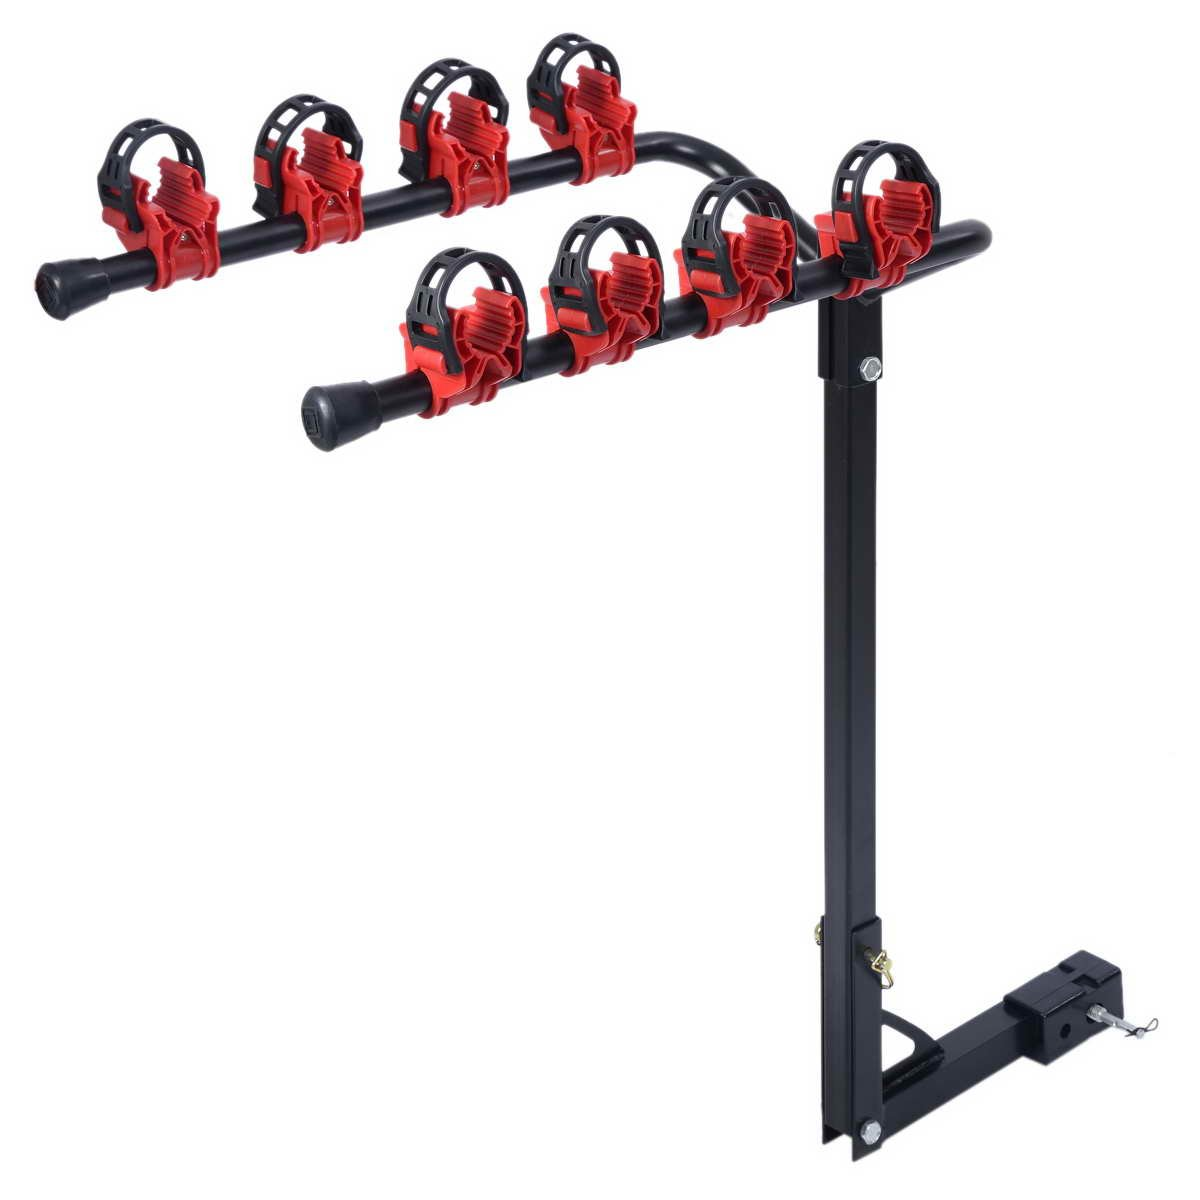 Swagman Titan 4 Bike Two Arm Fold Down Rack 2 Inch And 1 64029 Hitch Pin